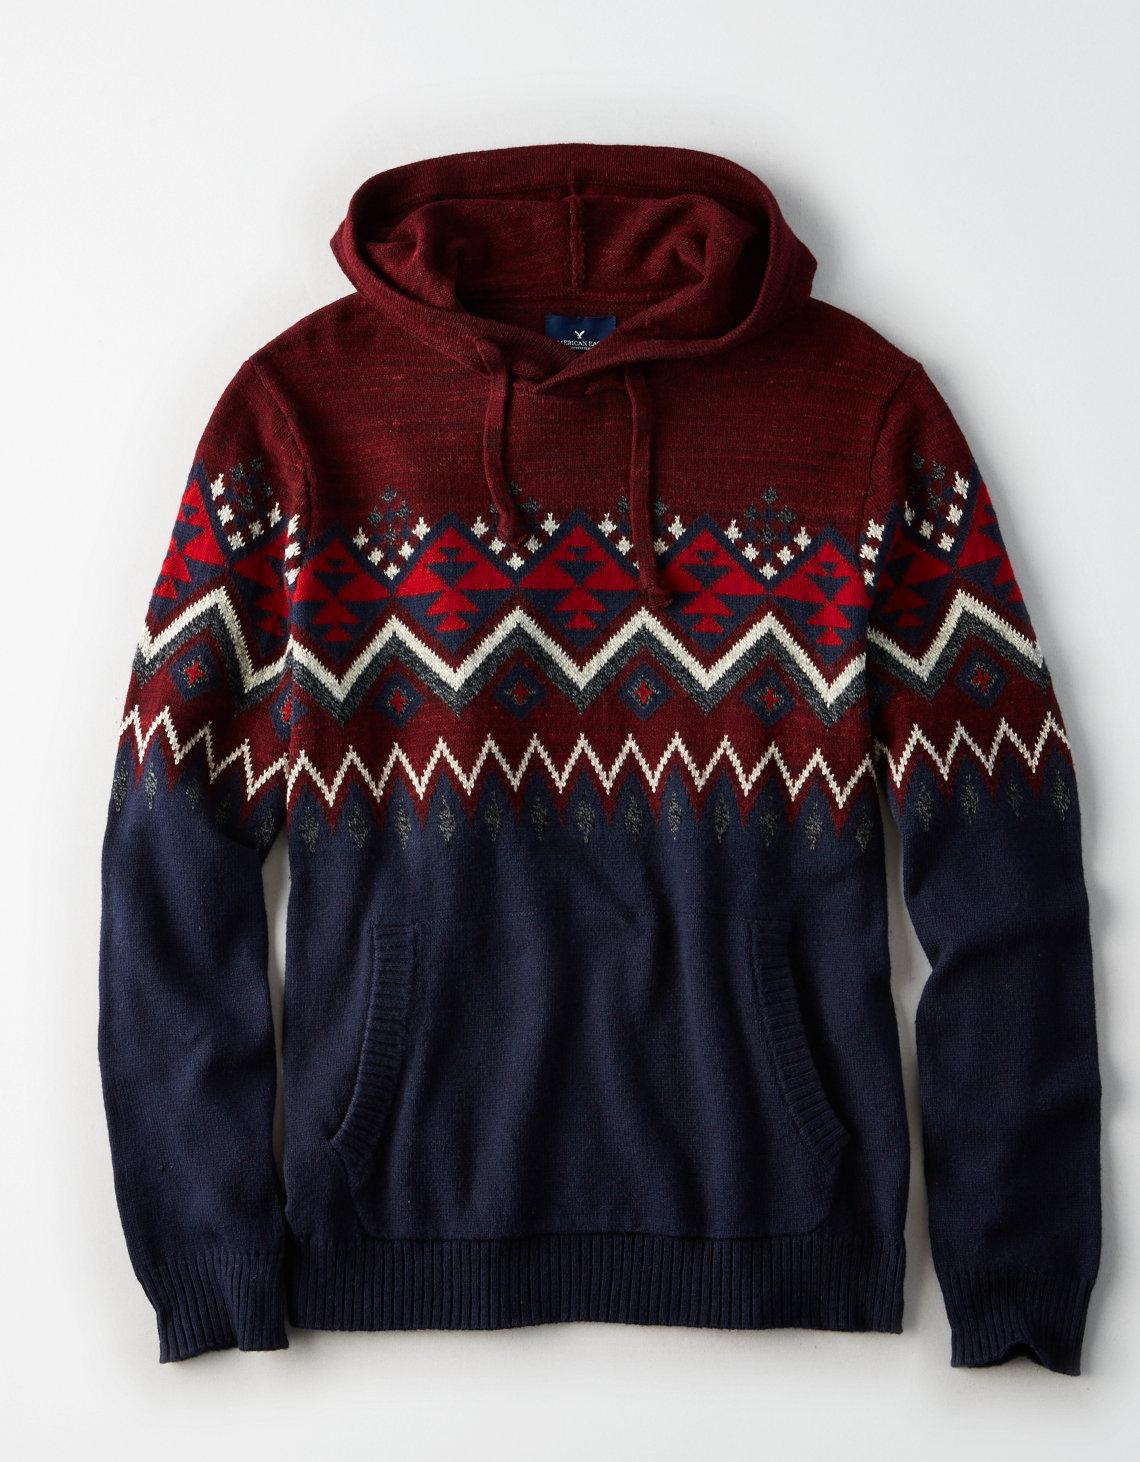 AE Baja Sweater Hoodie, Burgundy | American Eagle Outfitters